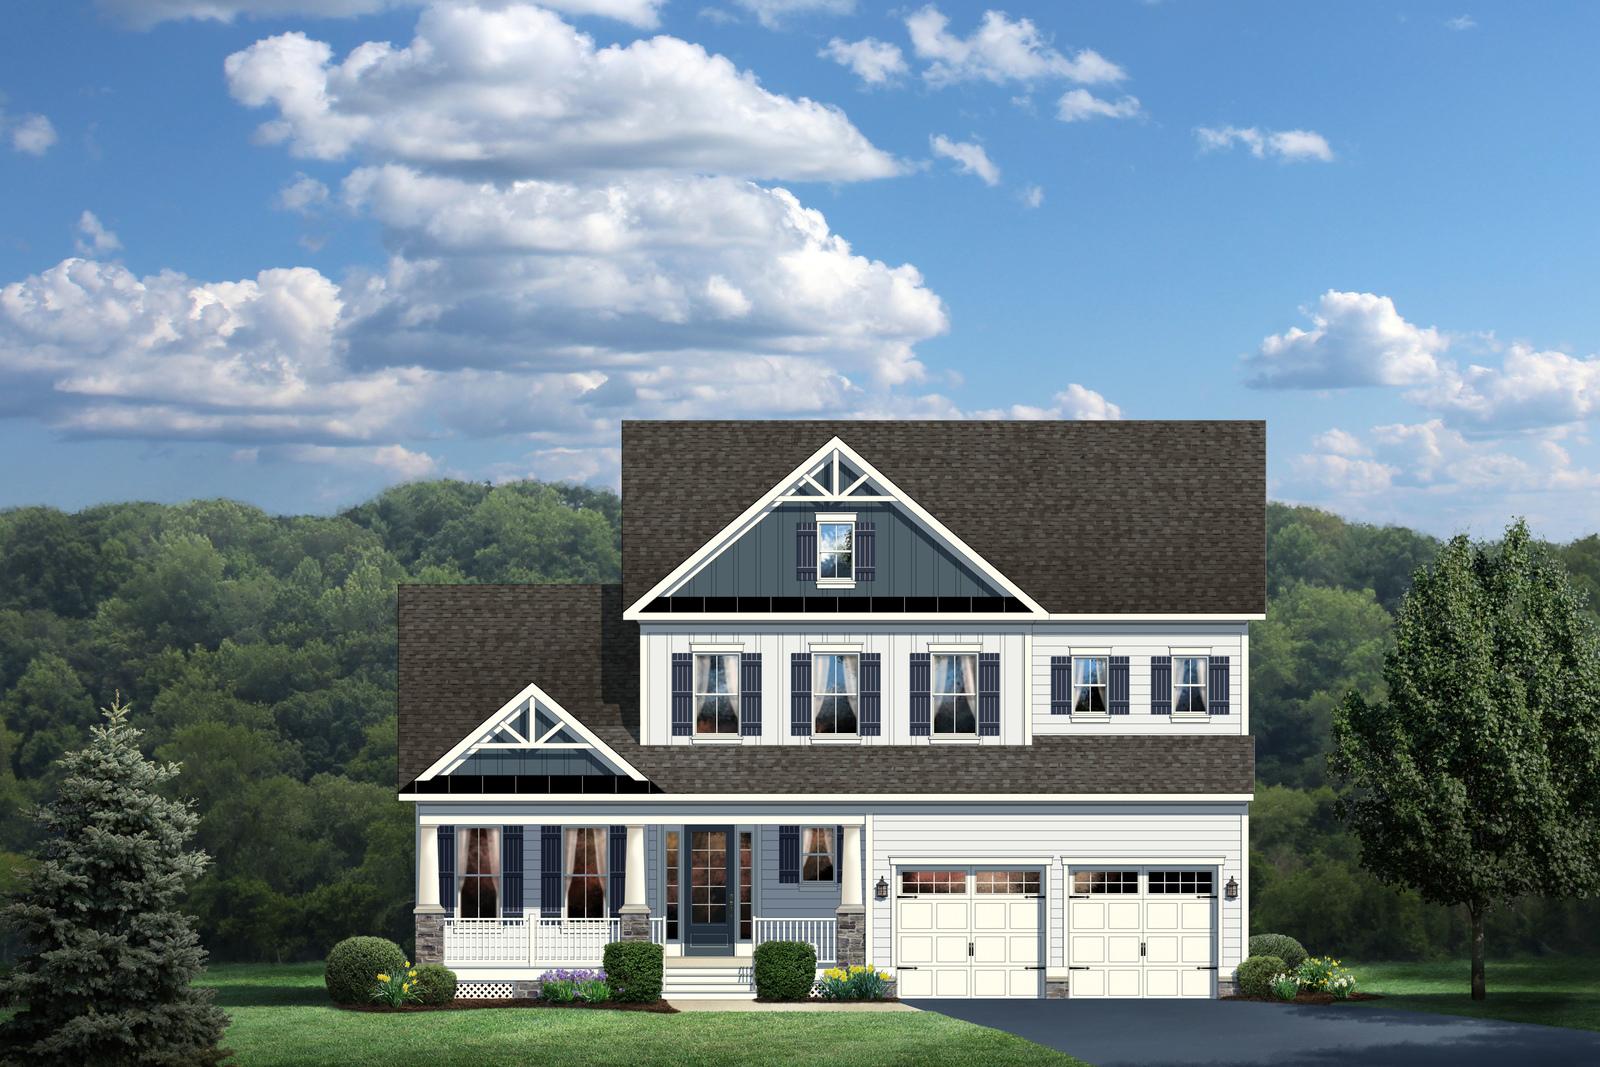 New cavanaugh home model for sale heartland homes for Heartland house